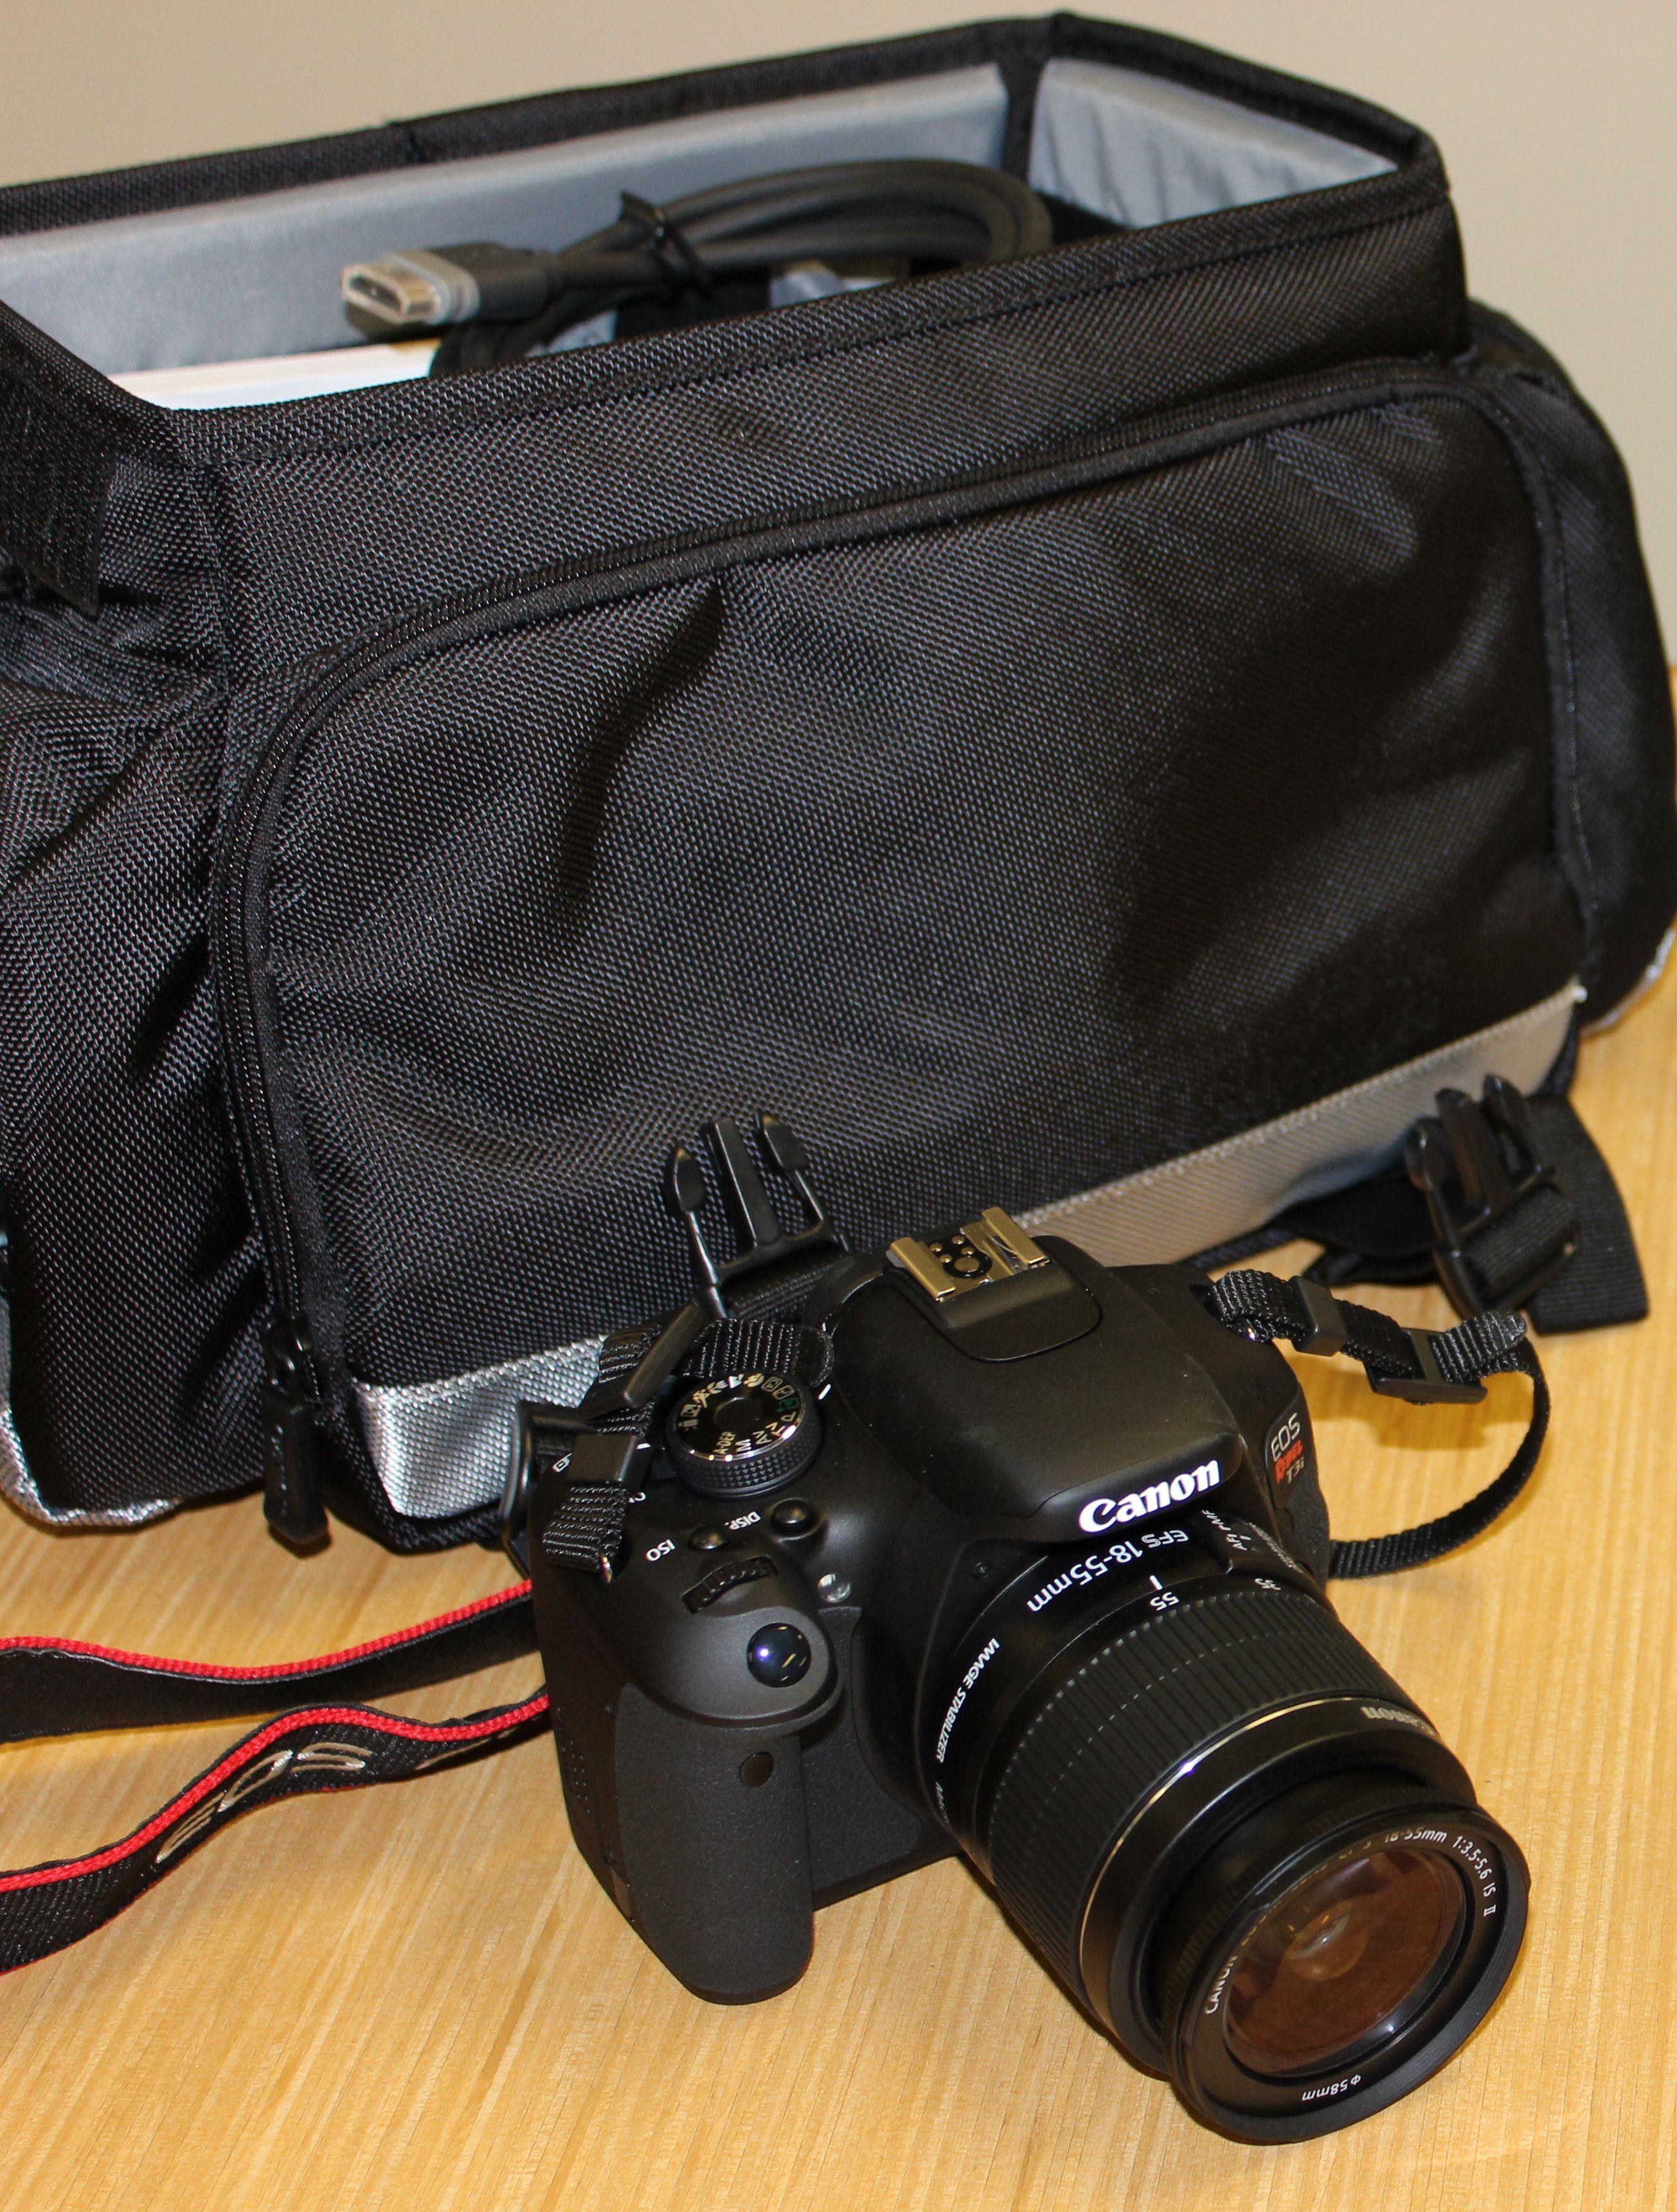 Canon EOS Rebel T3i Camera Kit